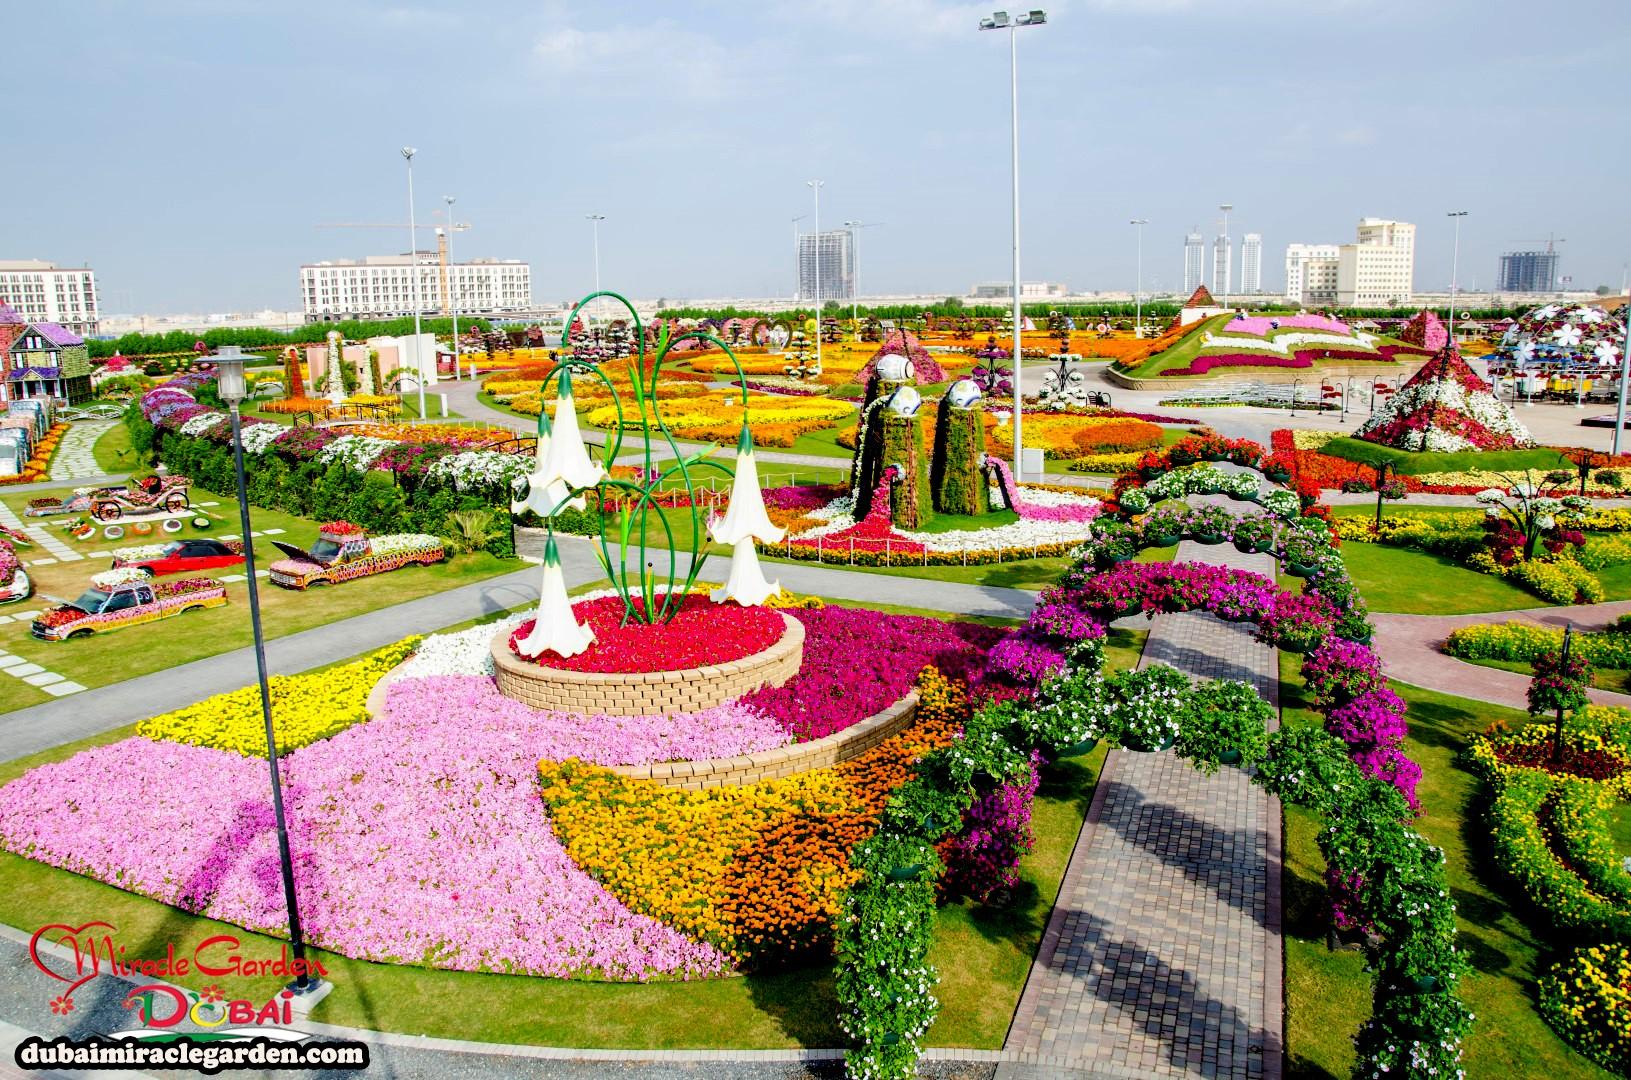 dubai miracle garden the world s biggest natural flower garden with